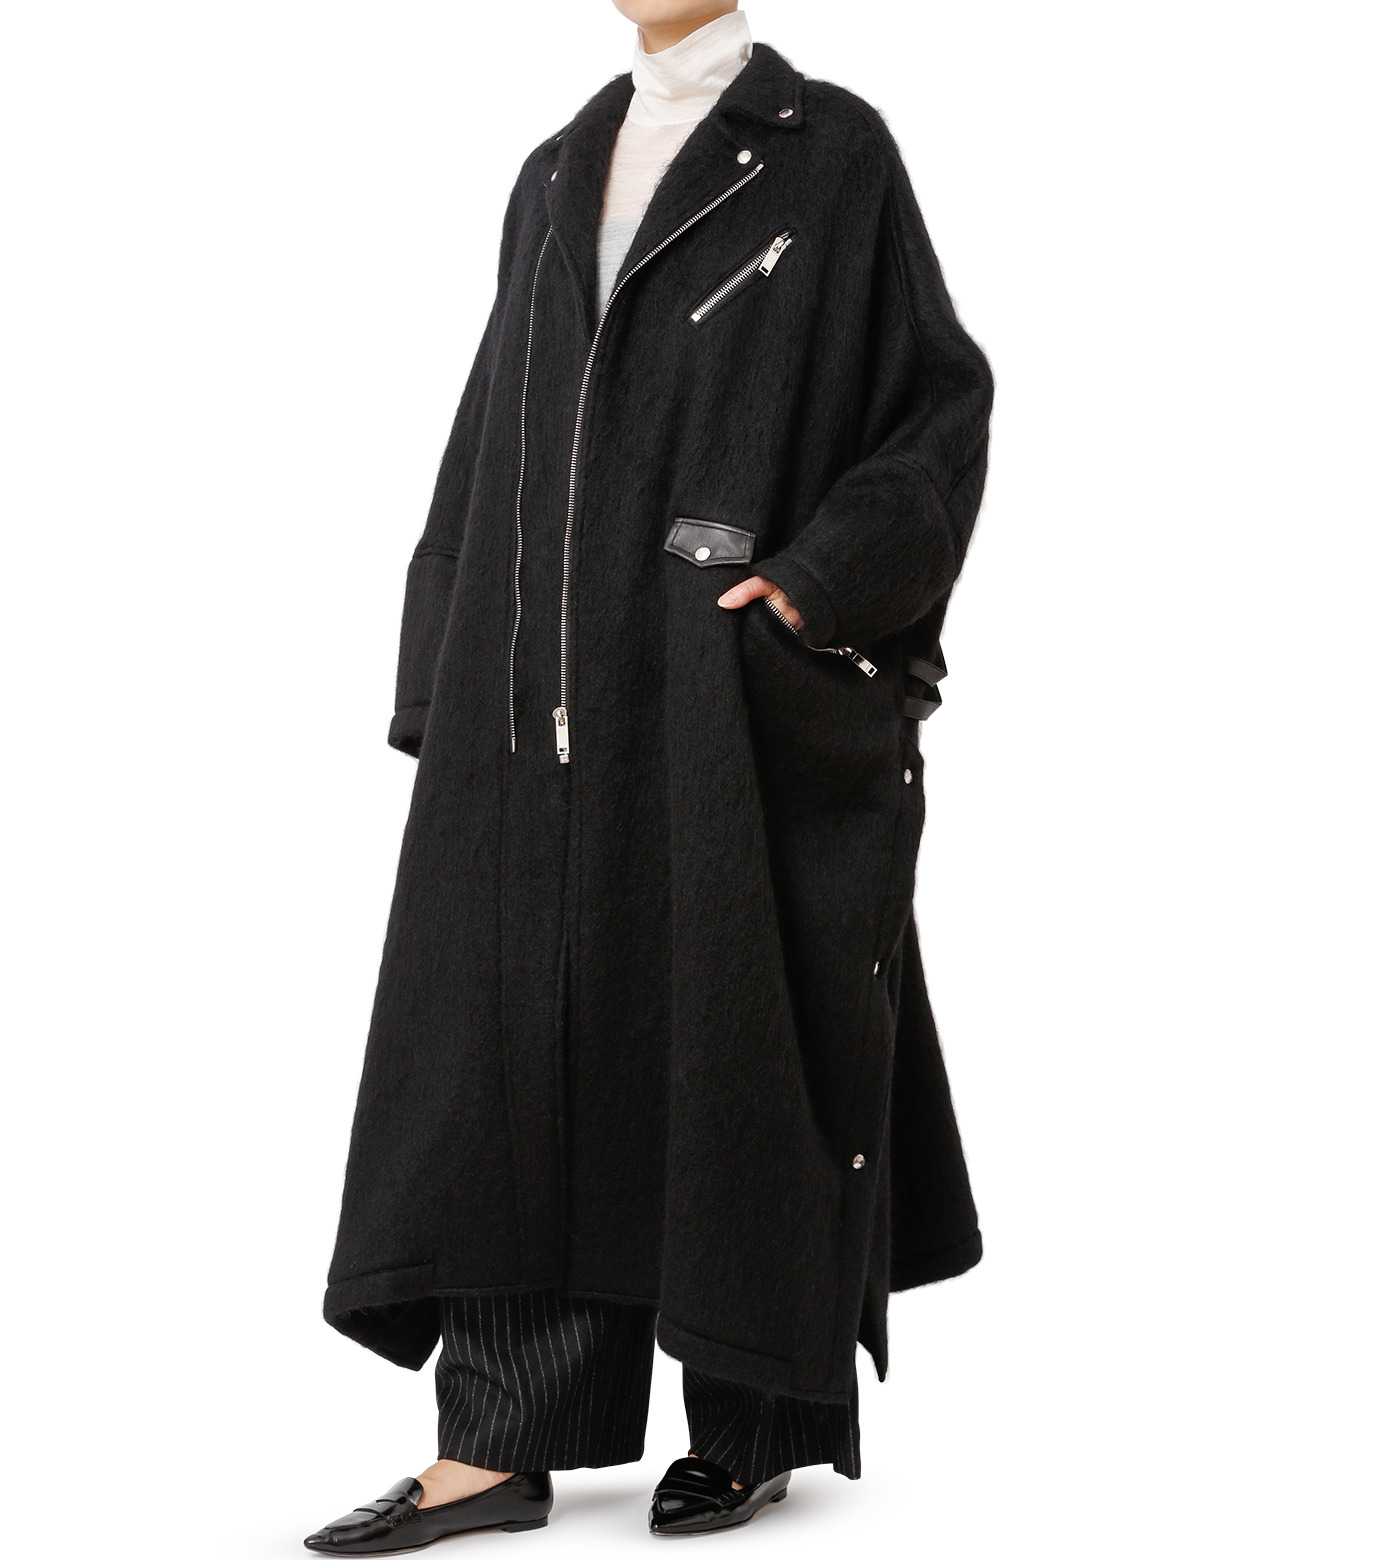 CHRISTIAN DADA(クリスチャン ダダ)のOversized Motorcycle Coat-BLACK(コート/coat)-16W-D-0301-13 拡大詳細画像3